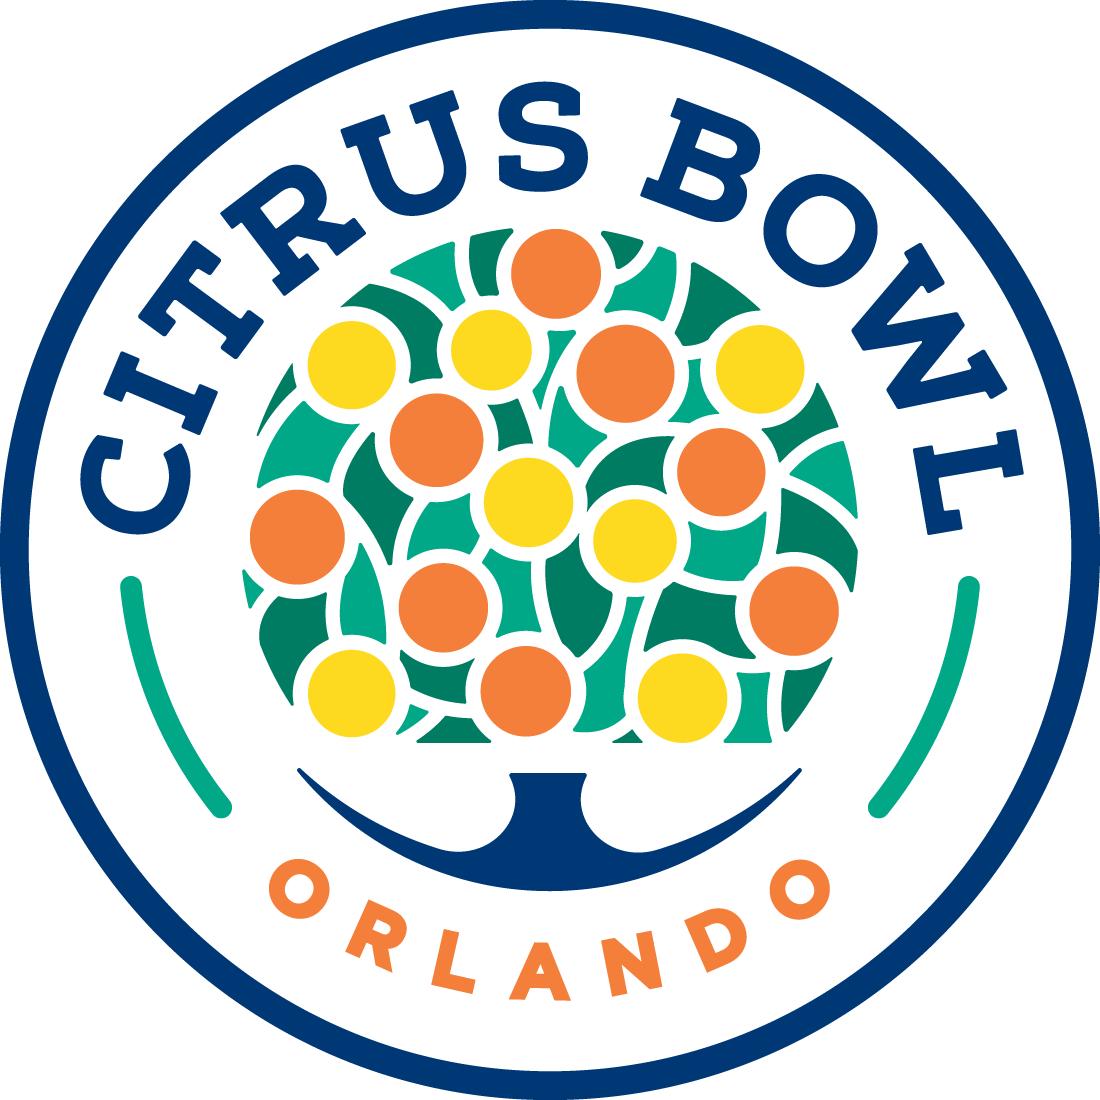 Image result for citrus bowl logo